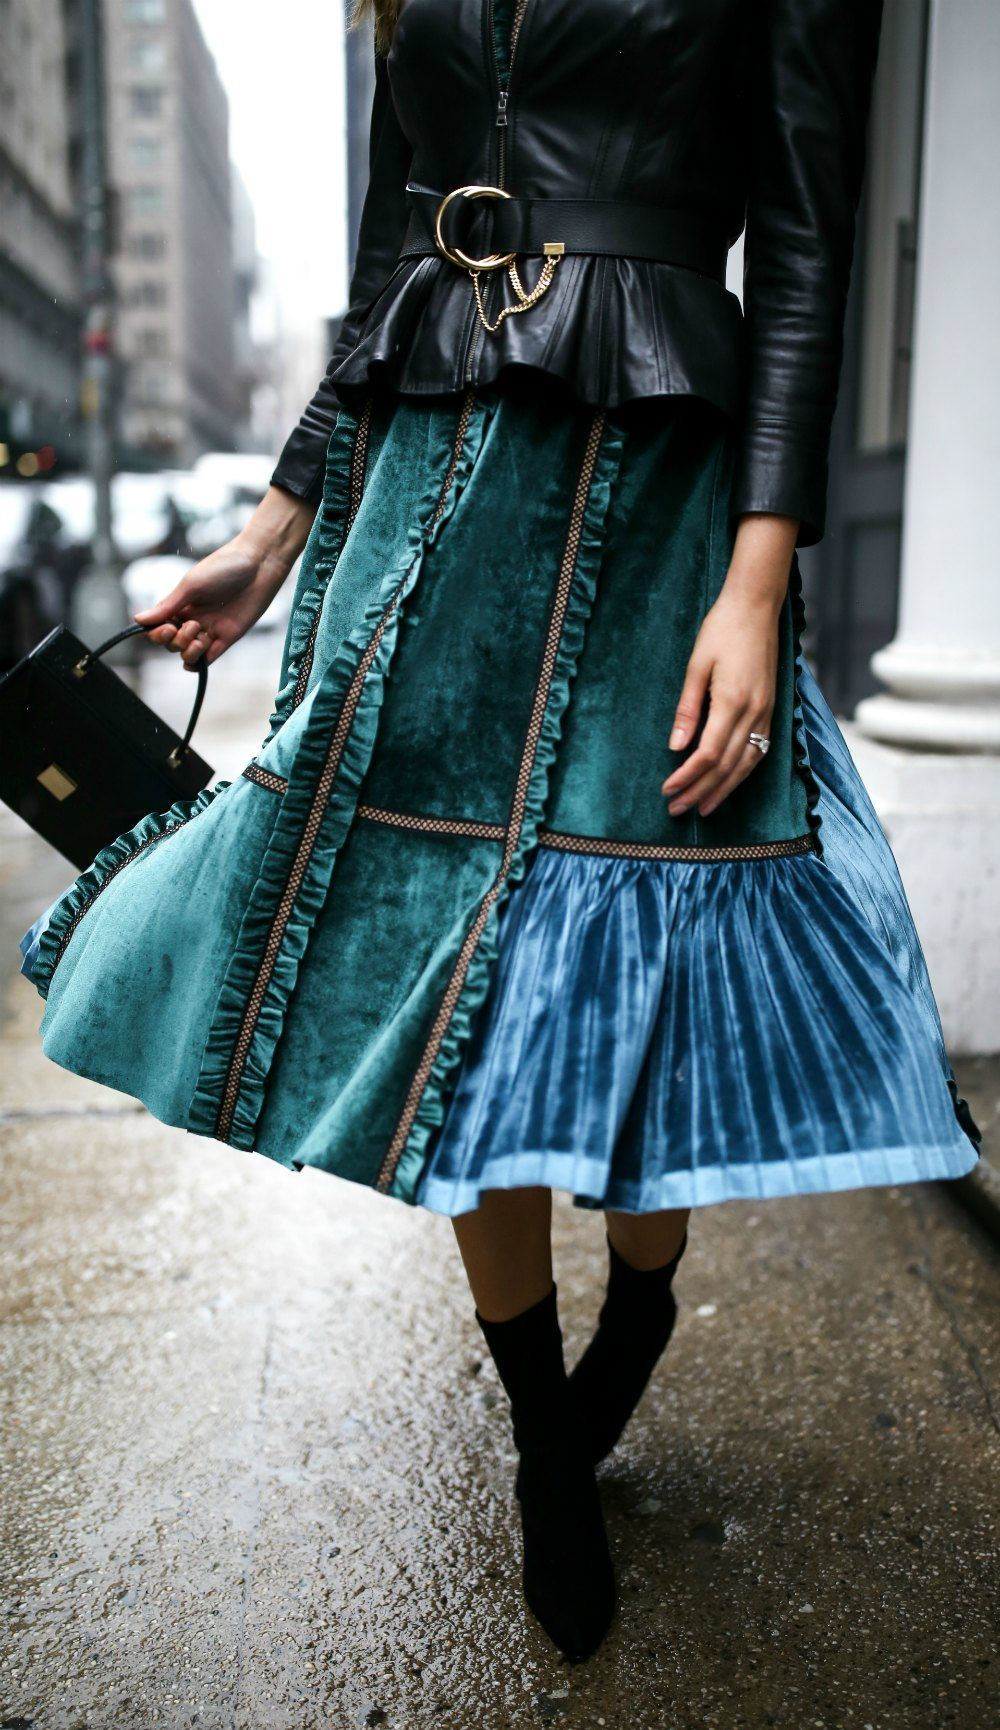 Velvet Dress Leather Jacket Forest Green Two Tone A Line Ruffle Trim Midi Dress Black Smooth Peplum Leat Leather Jacket Dress Fashion Nyc Blogger Fashion [ 1730 x 1000 Pixel ]